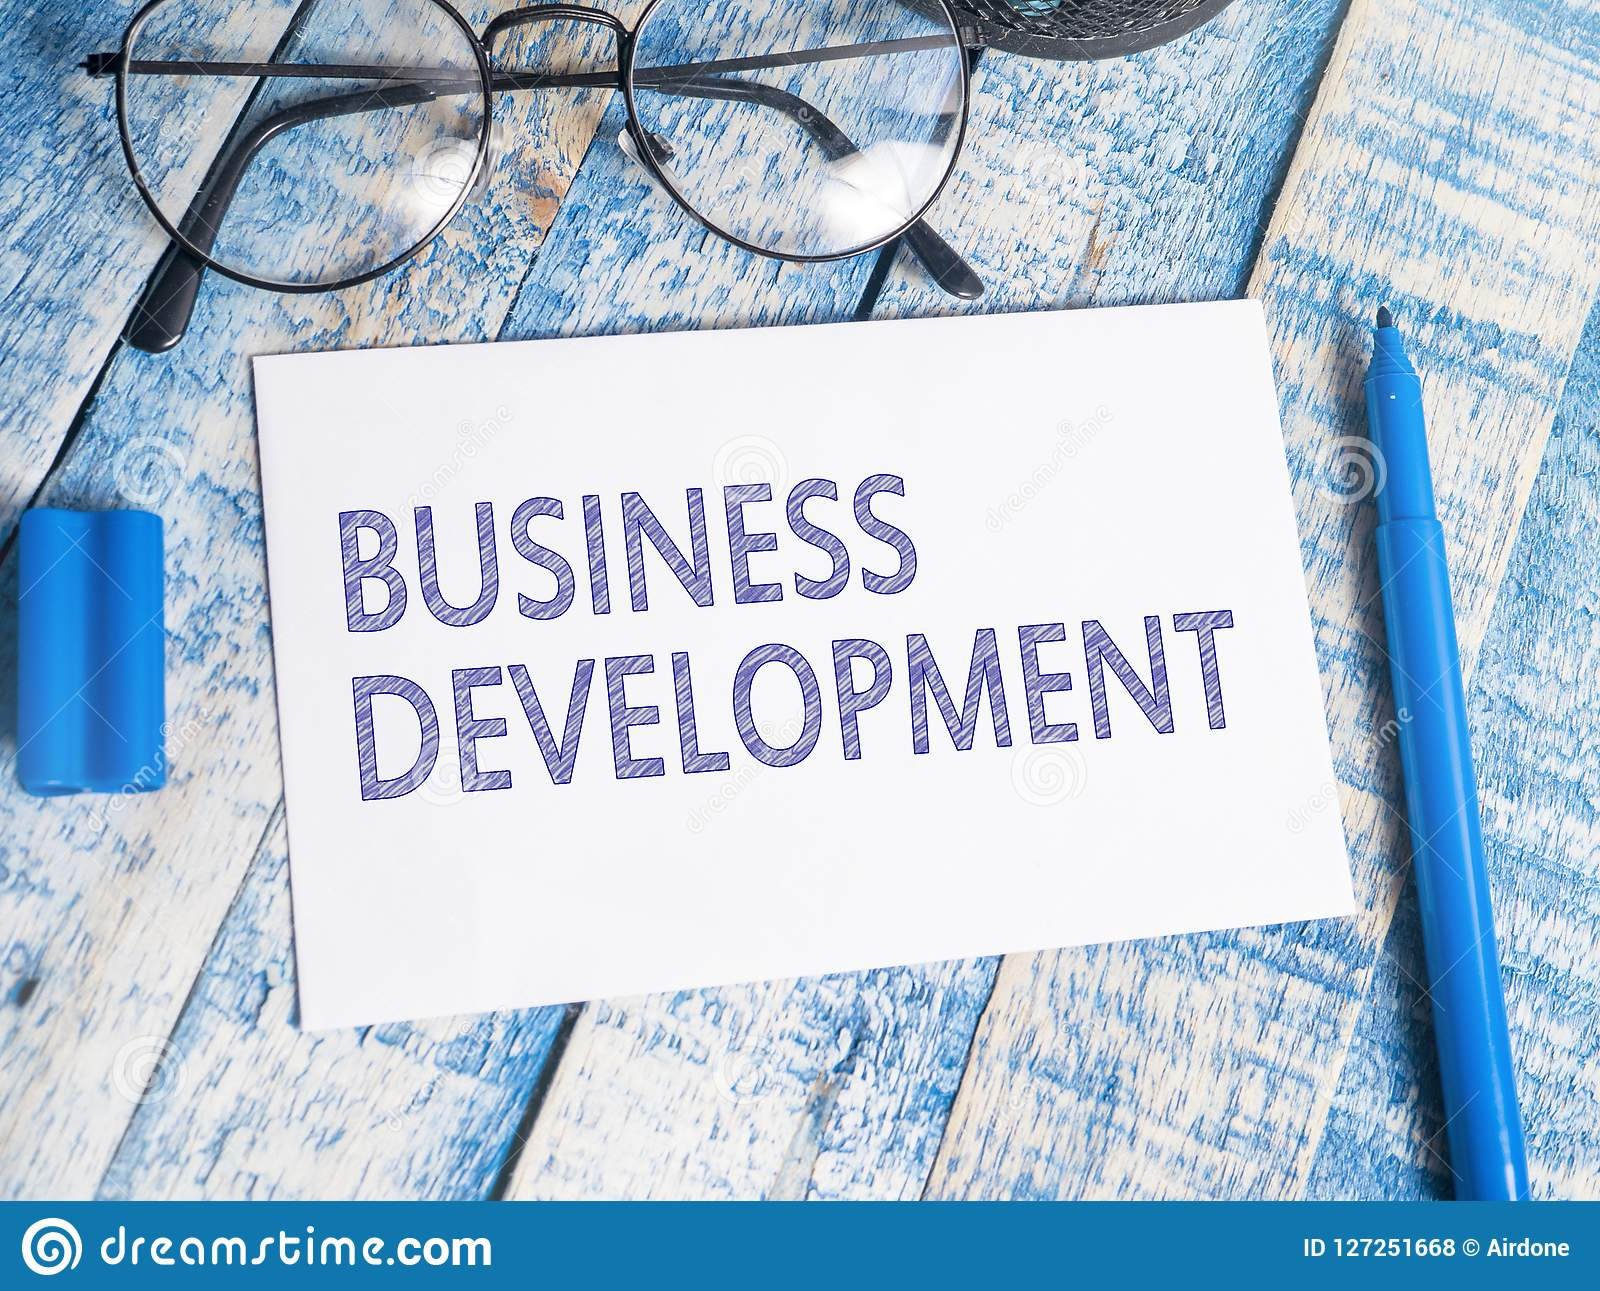 Business Development, Motivational Words Quotes Concept Stock